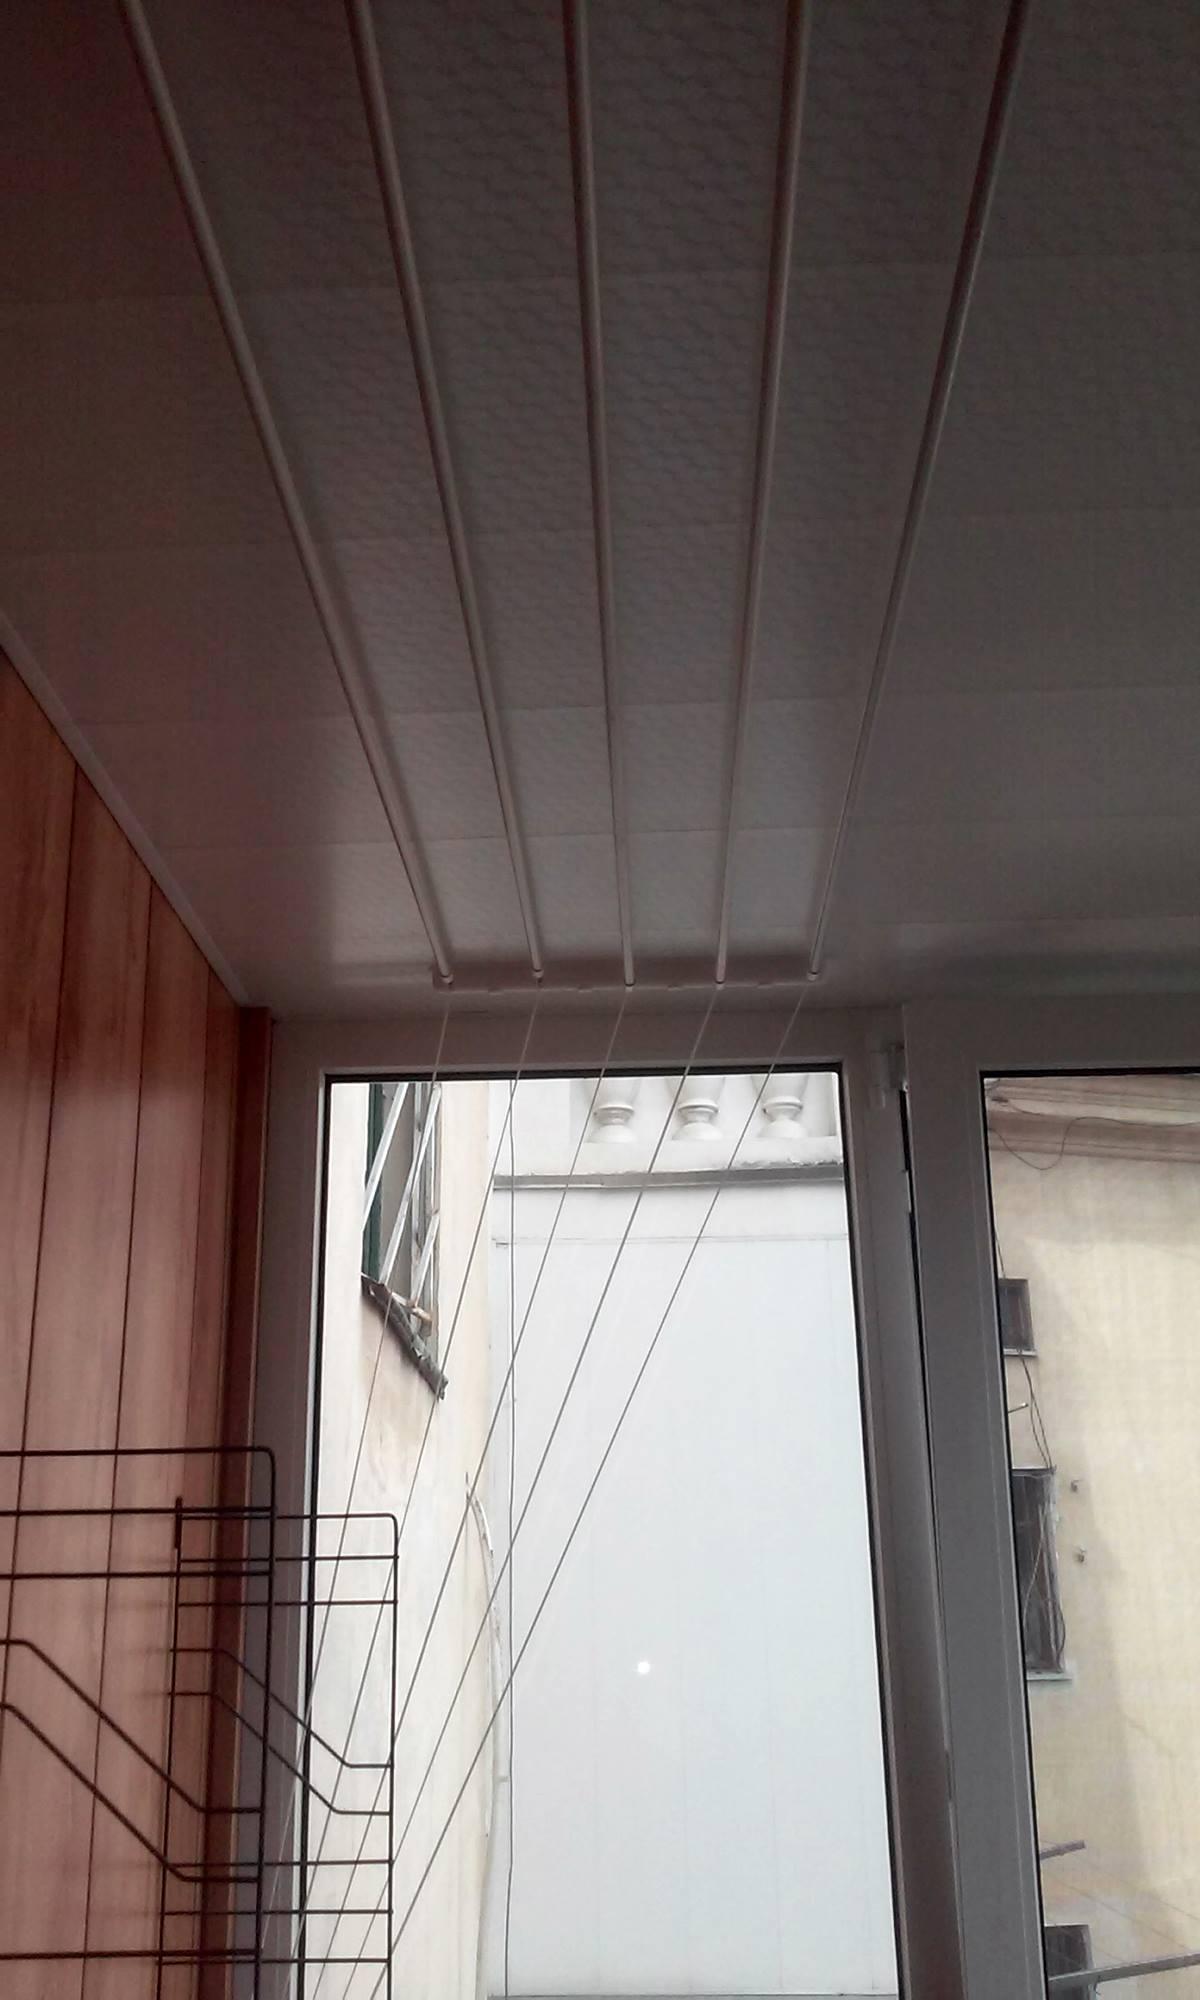 balkony20150401_115758